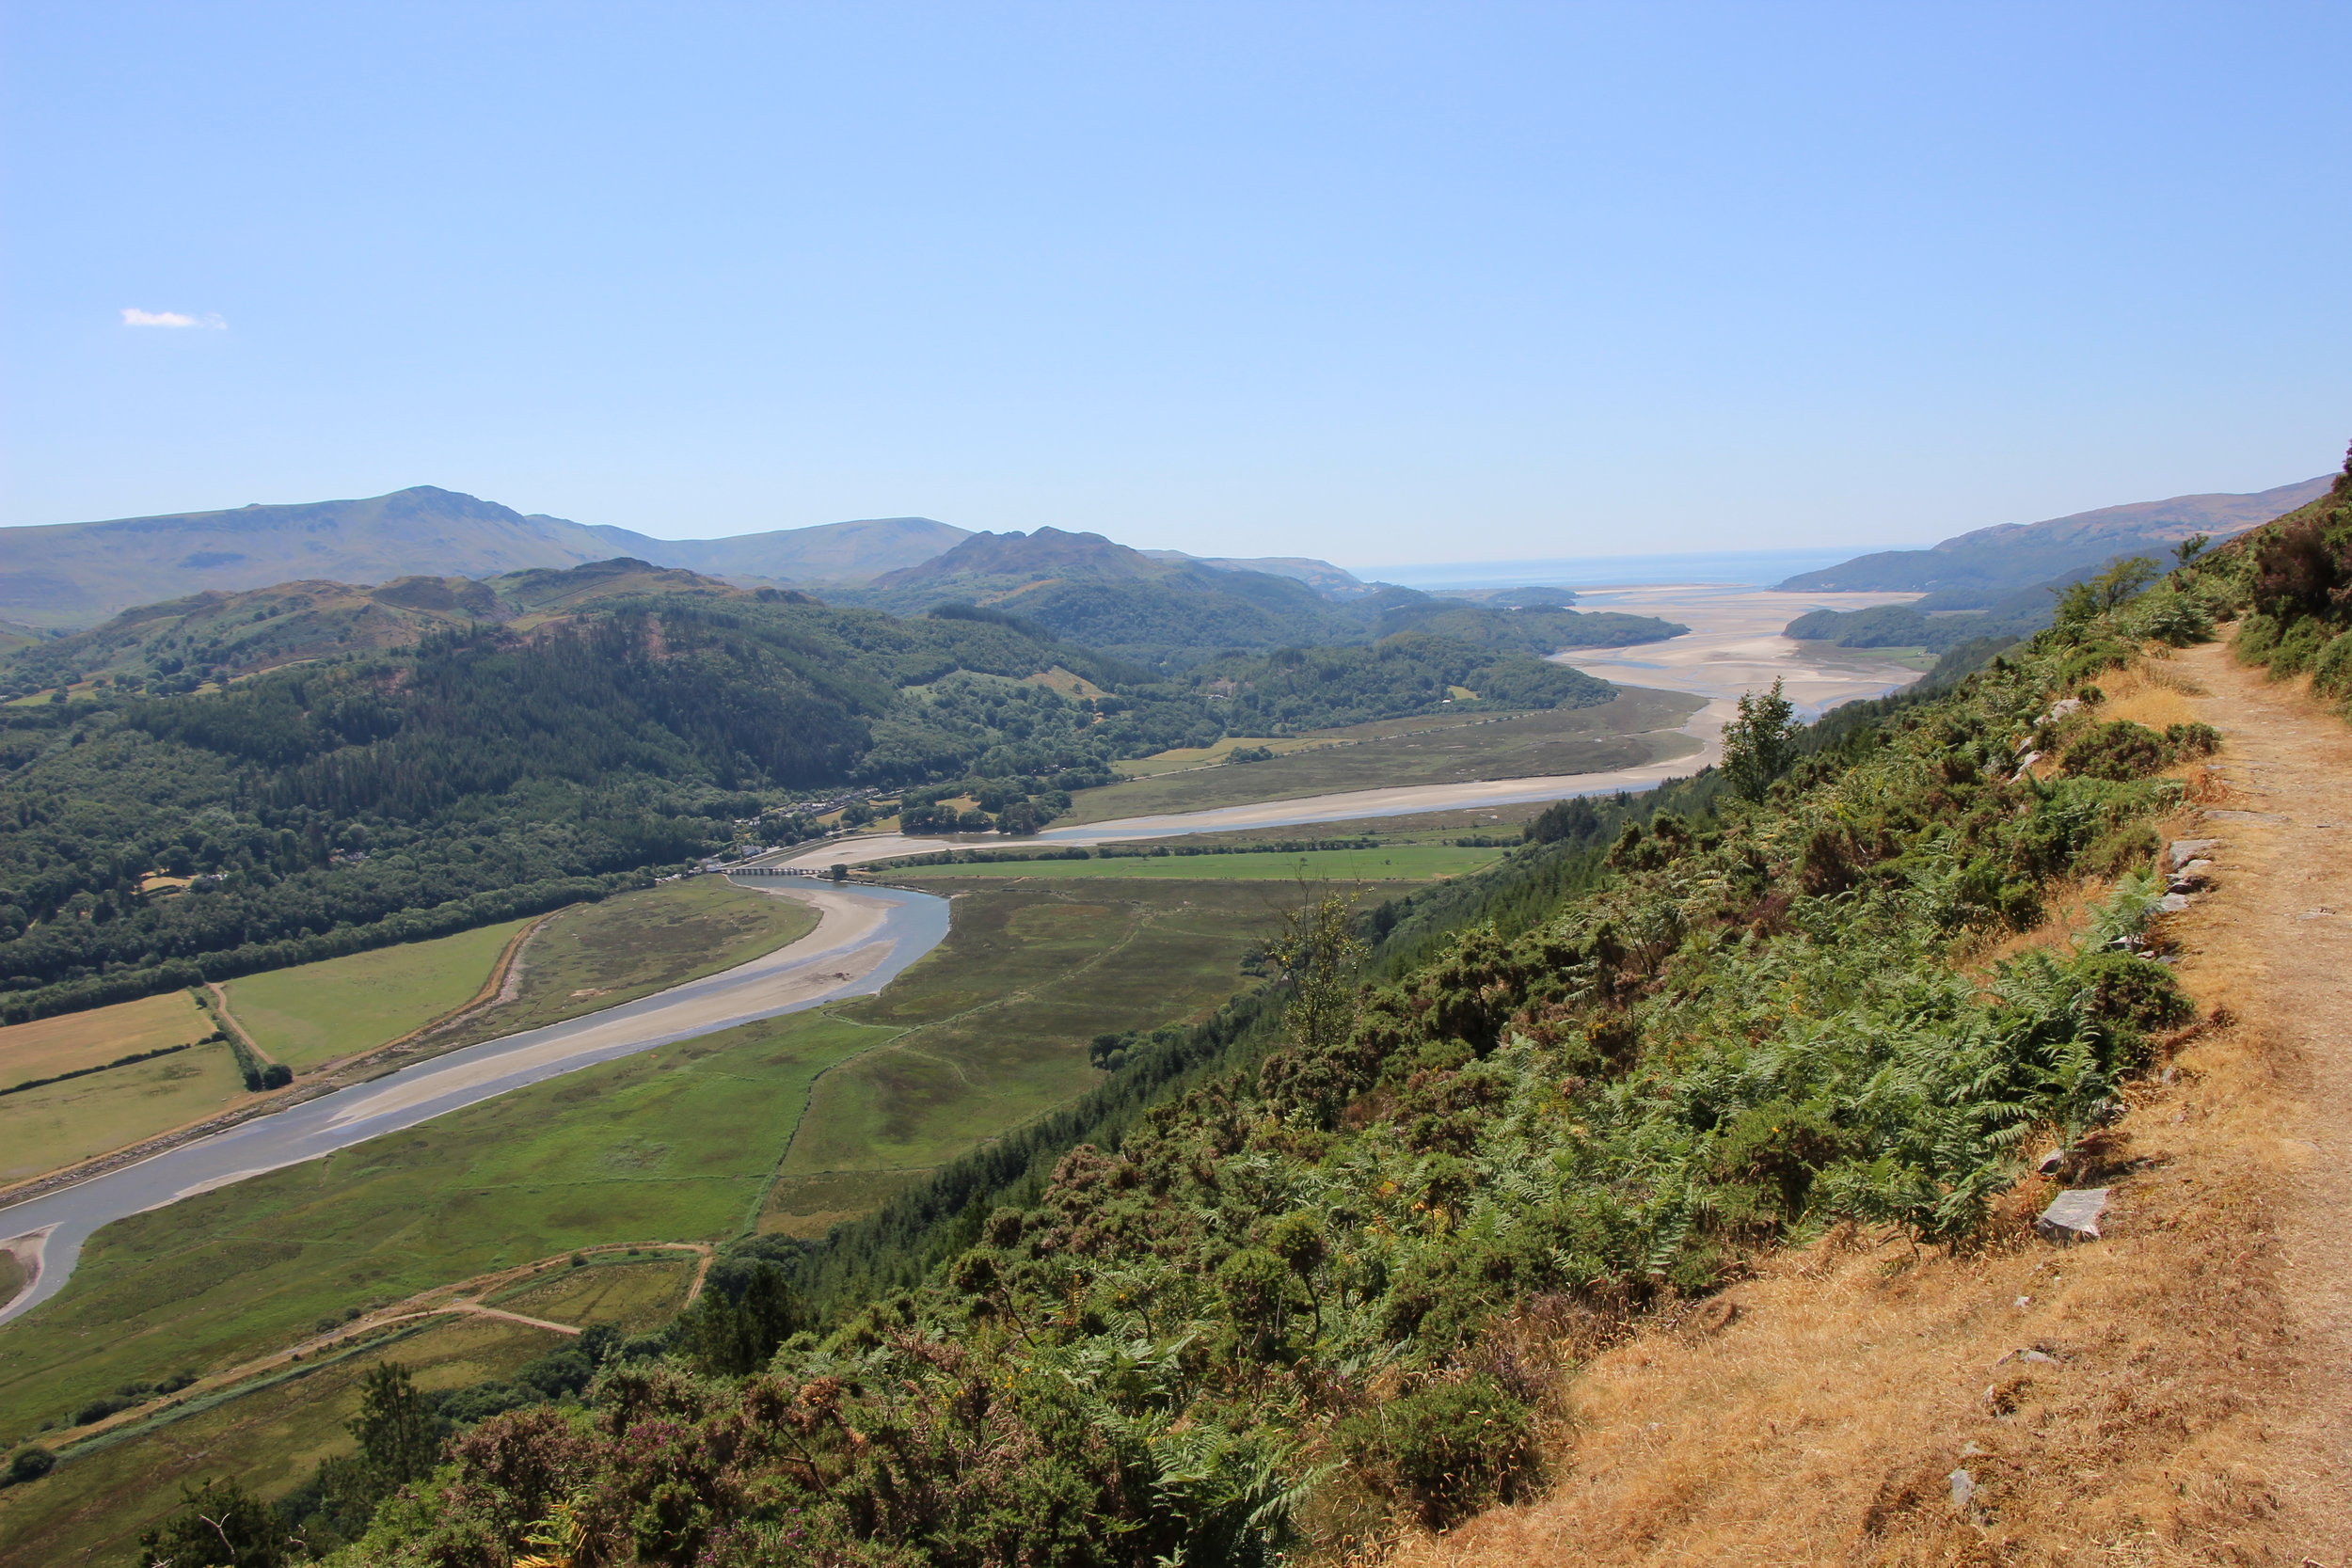 View over Mawddach Estuary